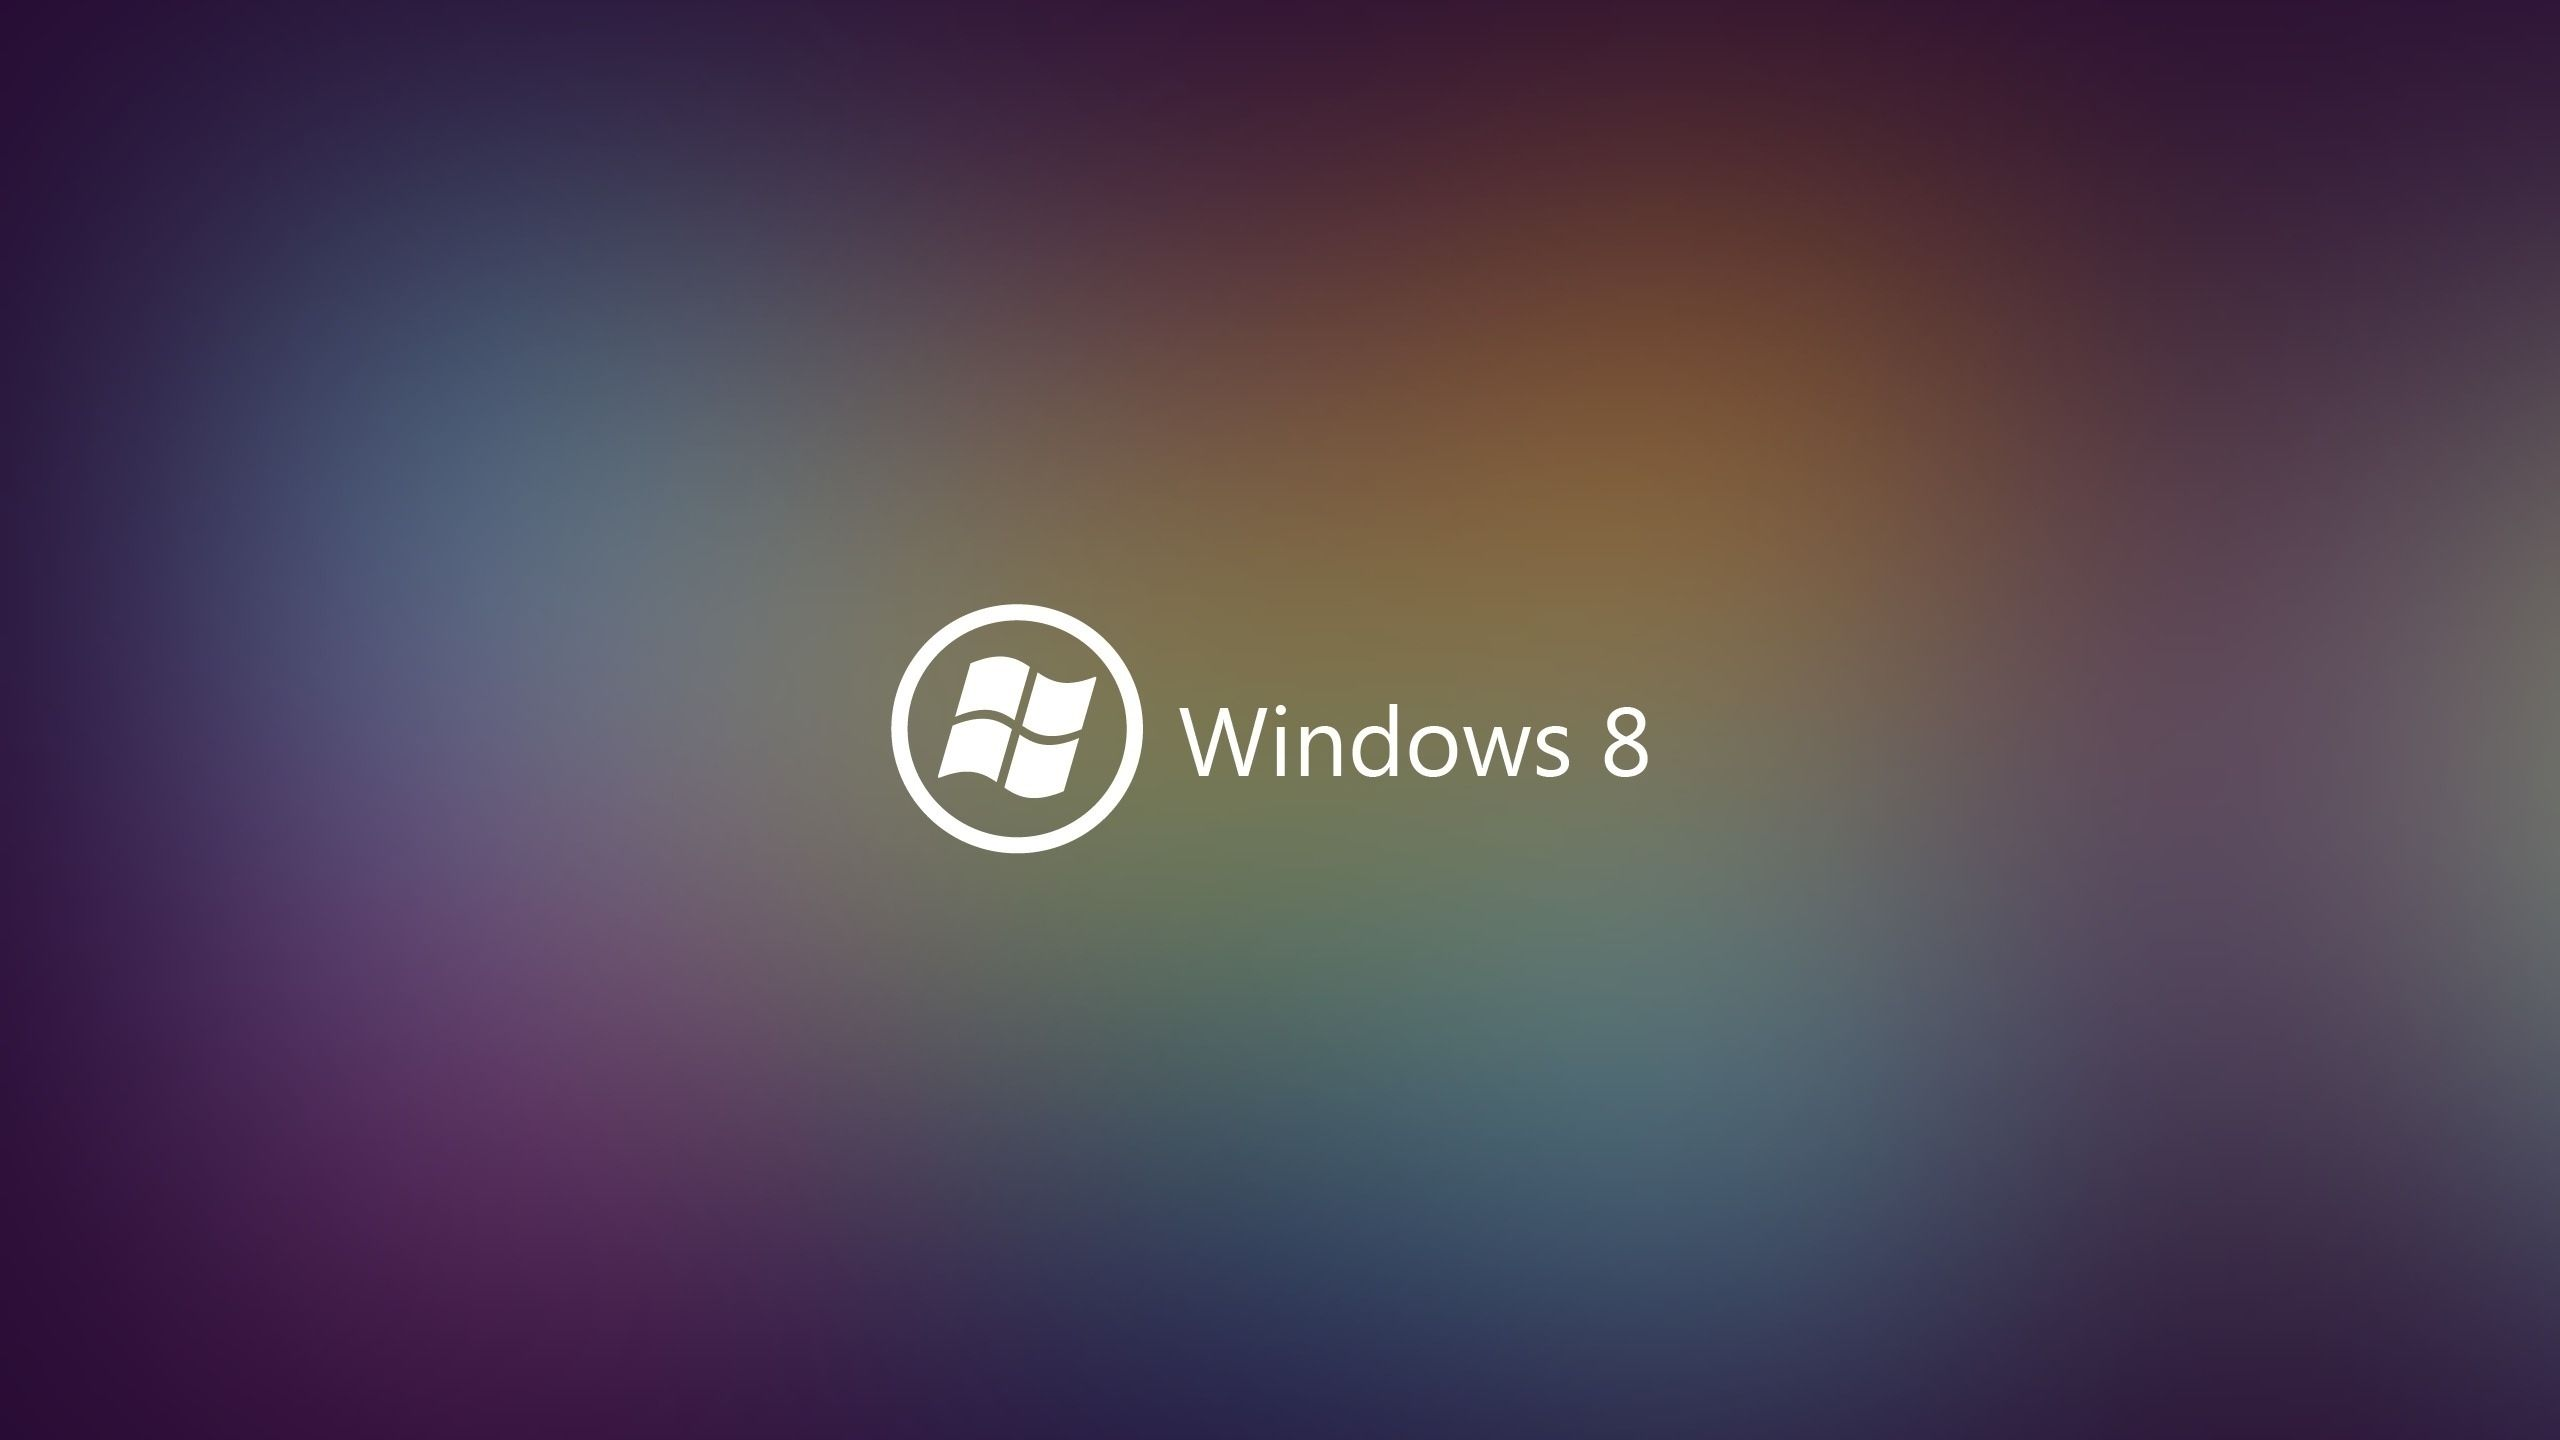 mac imac 27 windows 8 wallpapers hd, desktop backgrounds 2560x1440